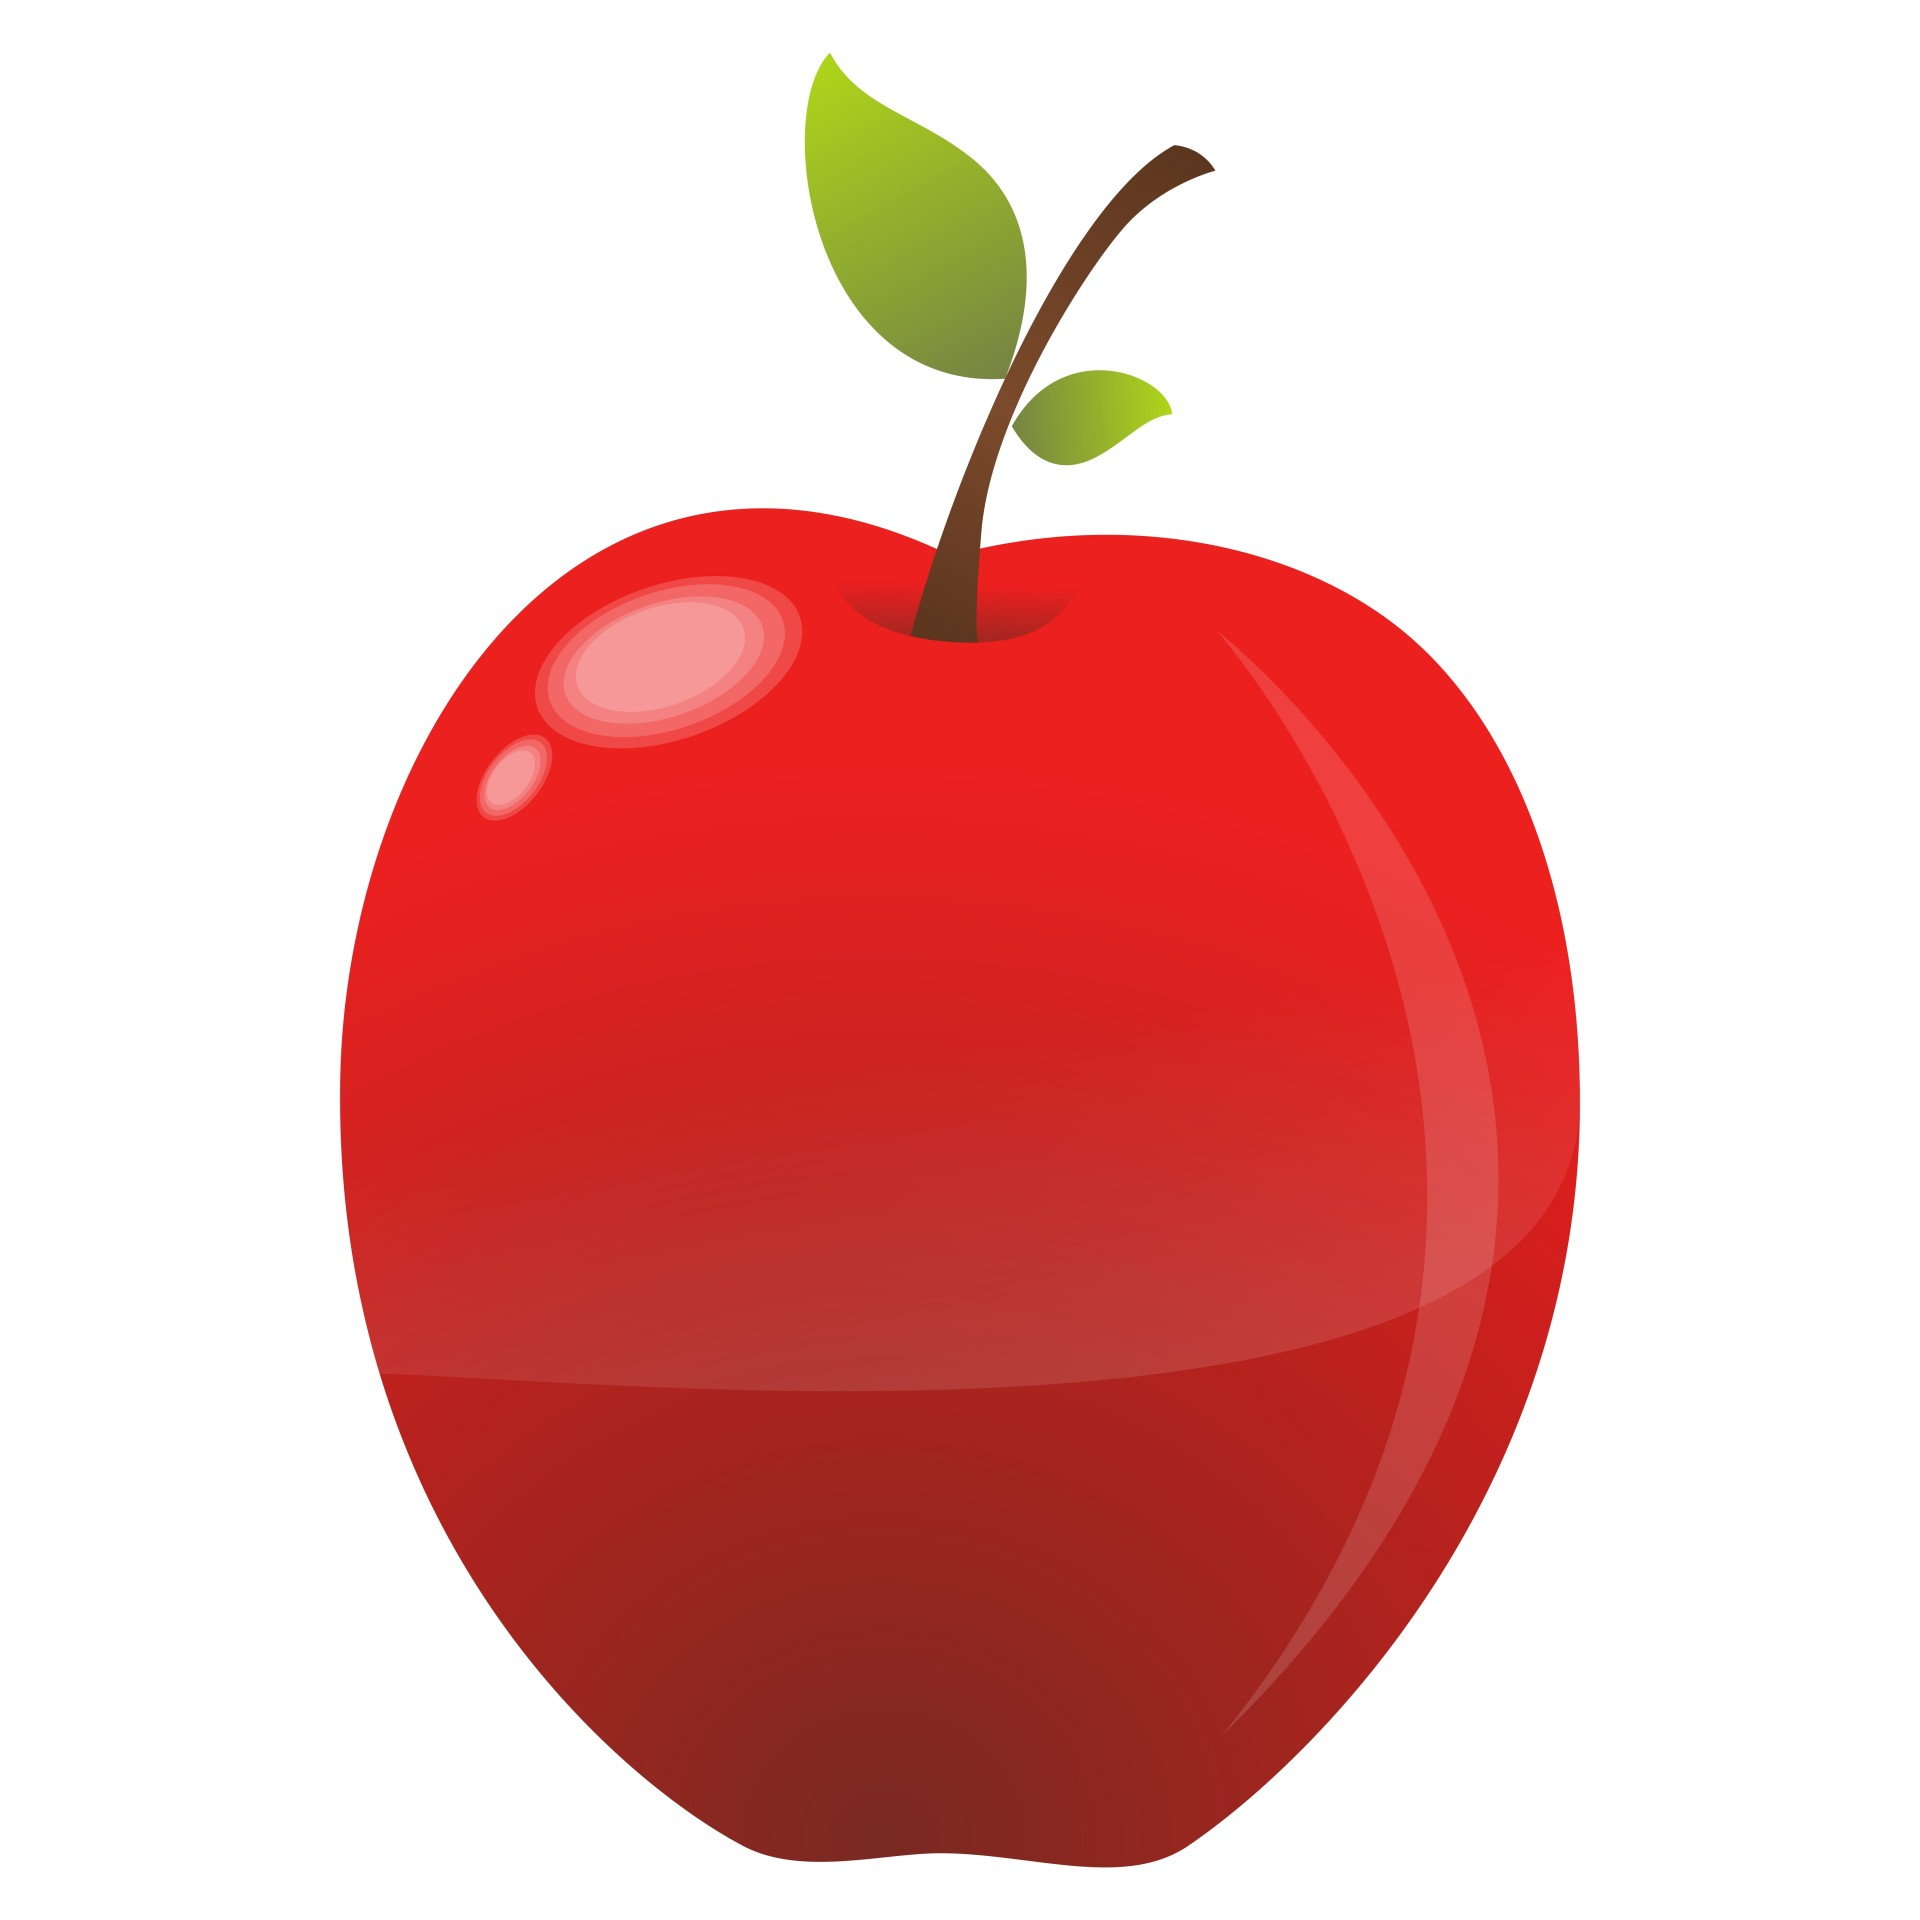 1920x1920 Red Apple Free Stock Photo